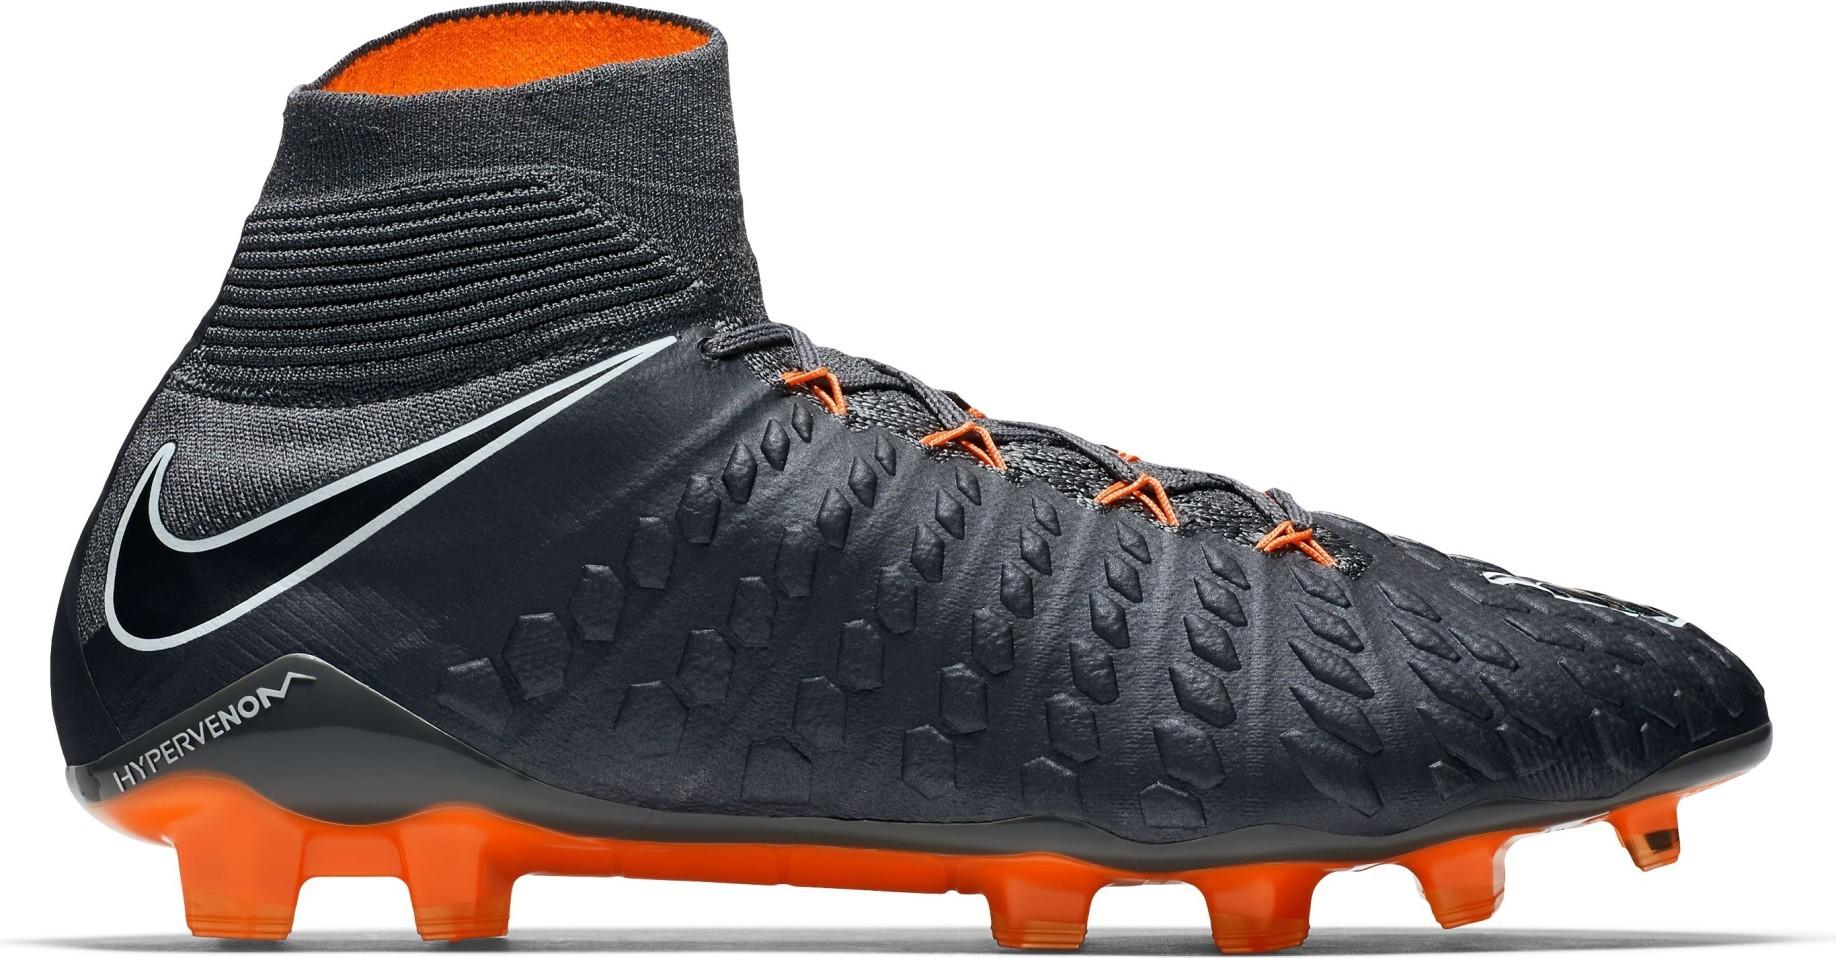 11c33938ff3b Football boots Nike Hypervenom Phantom III FG Fast AF Pack colore Grey  Orange - Nike - SportIT.com